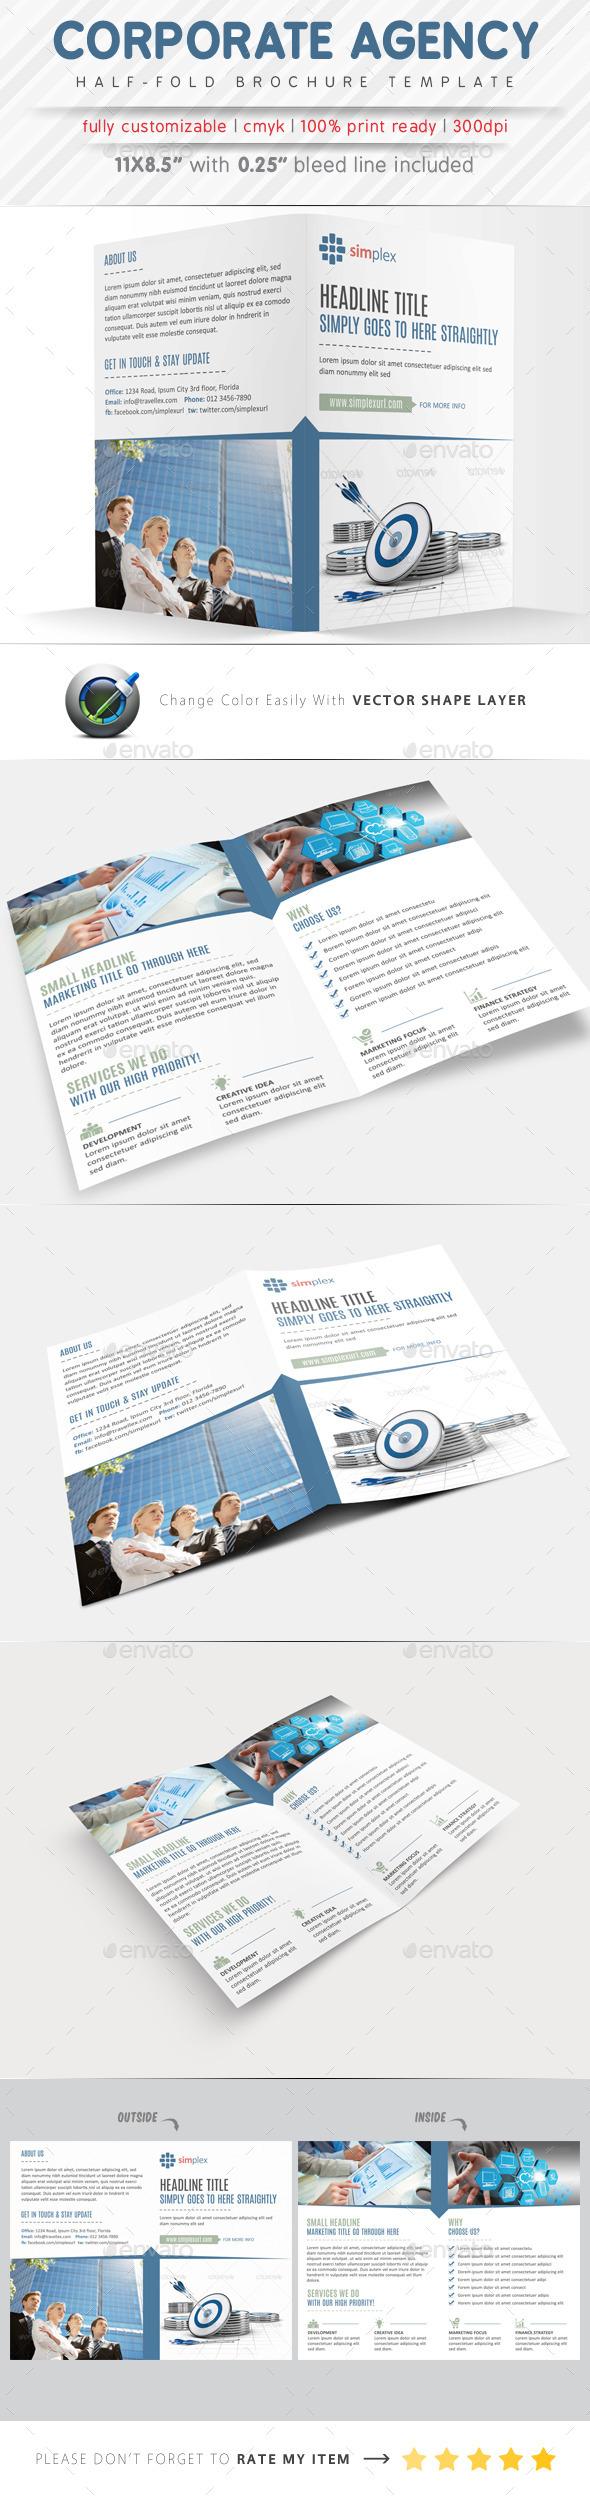 Corporate Agency Half Fold Brochure